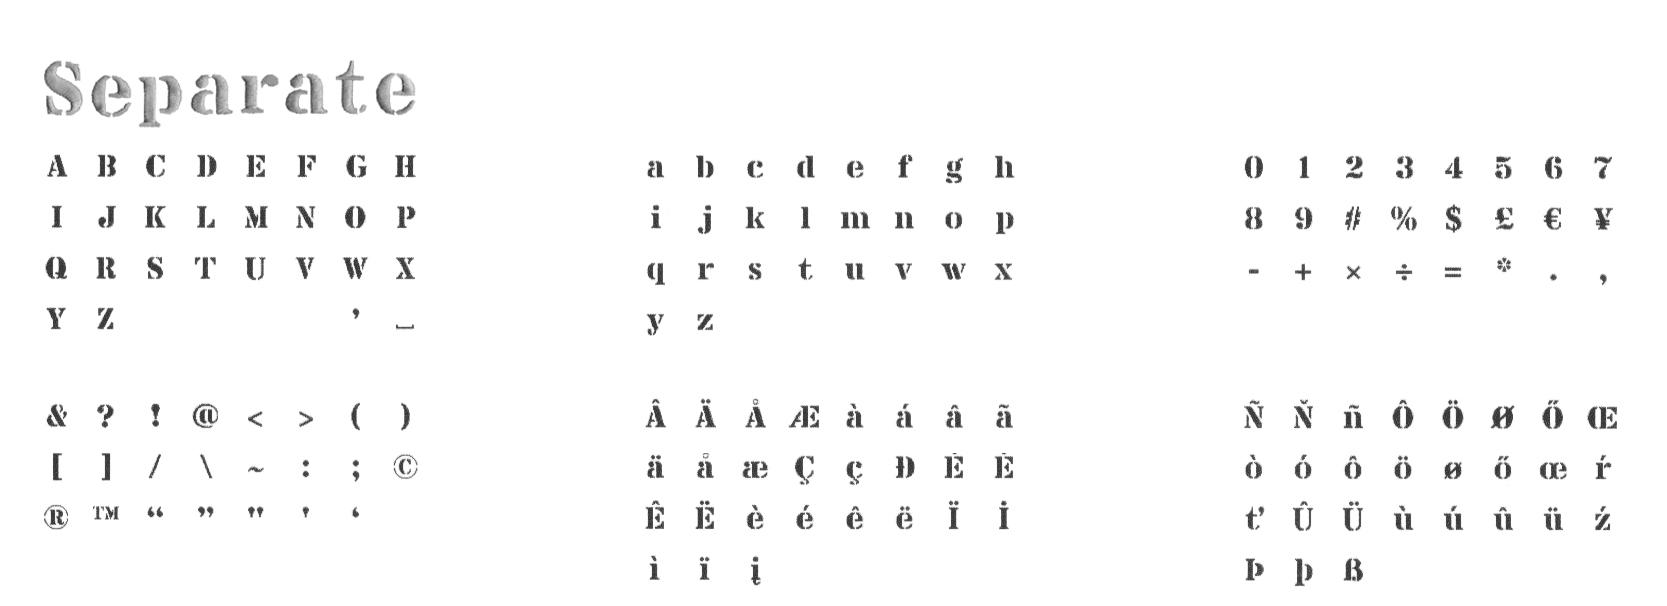 Broderie lettre scindée - Separate